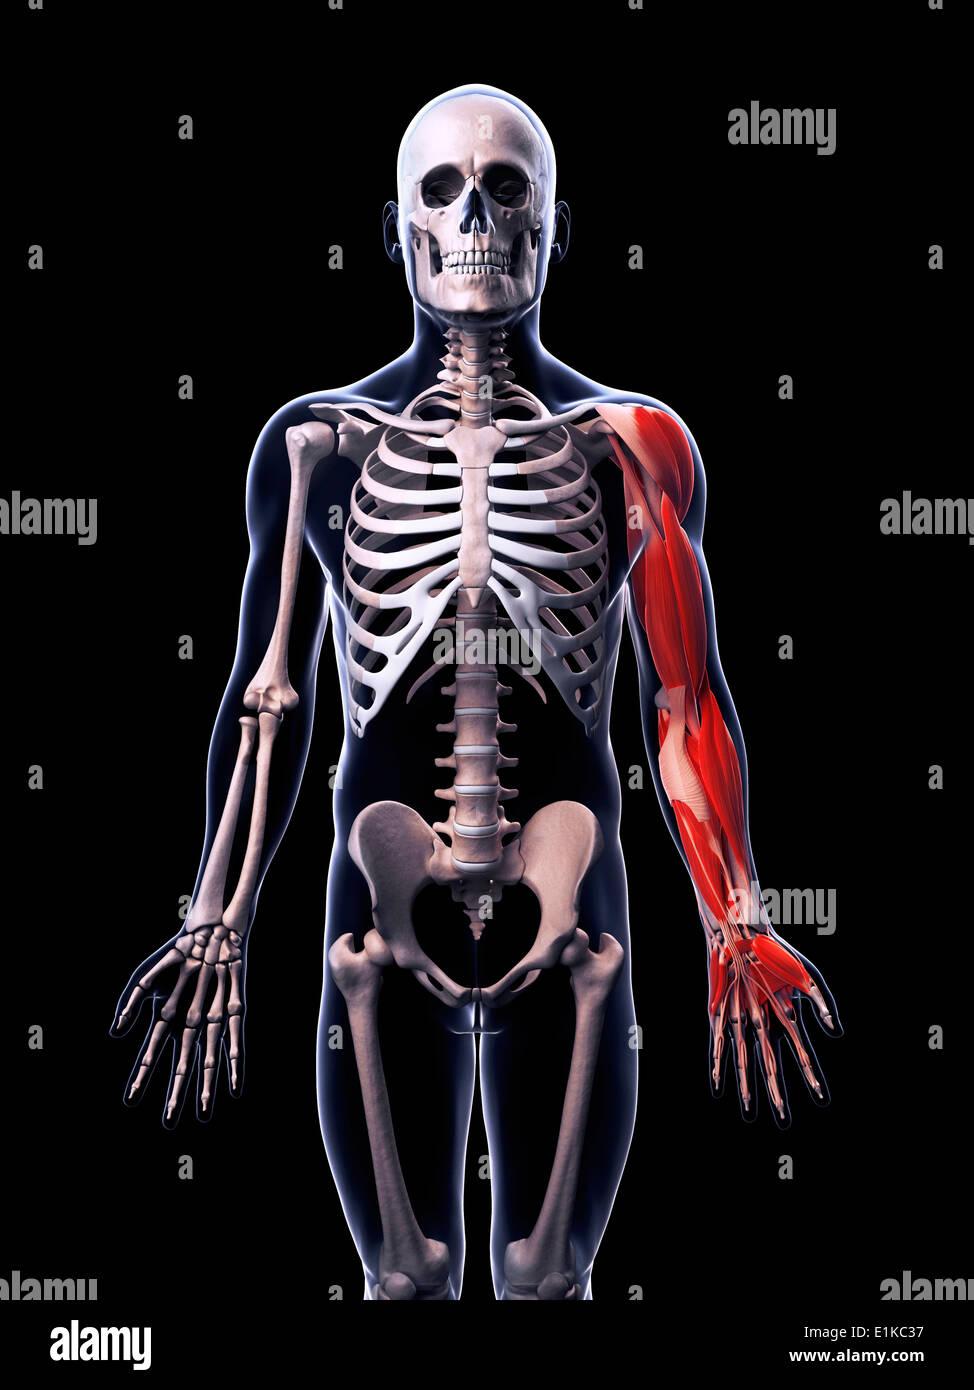 Human Muscular System Stockfotos & Human Muscular System Bilder - Alamy